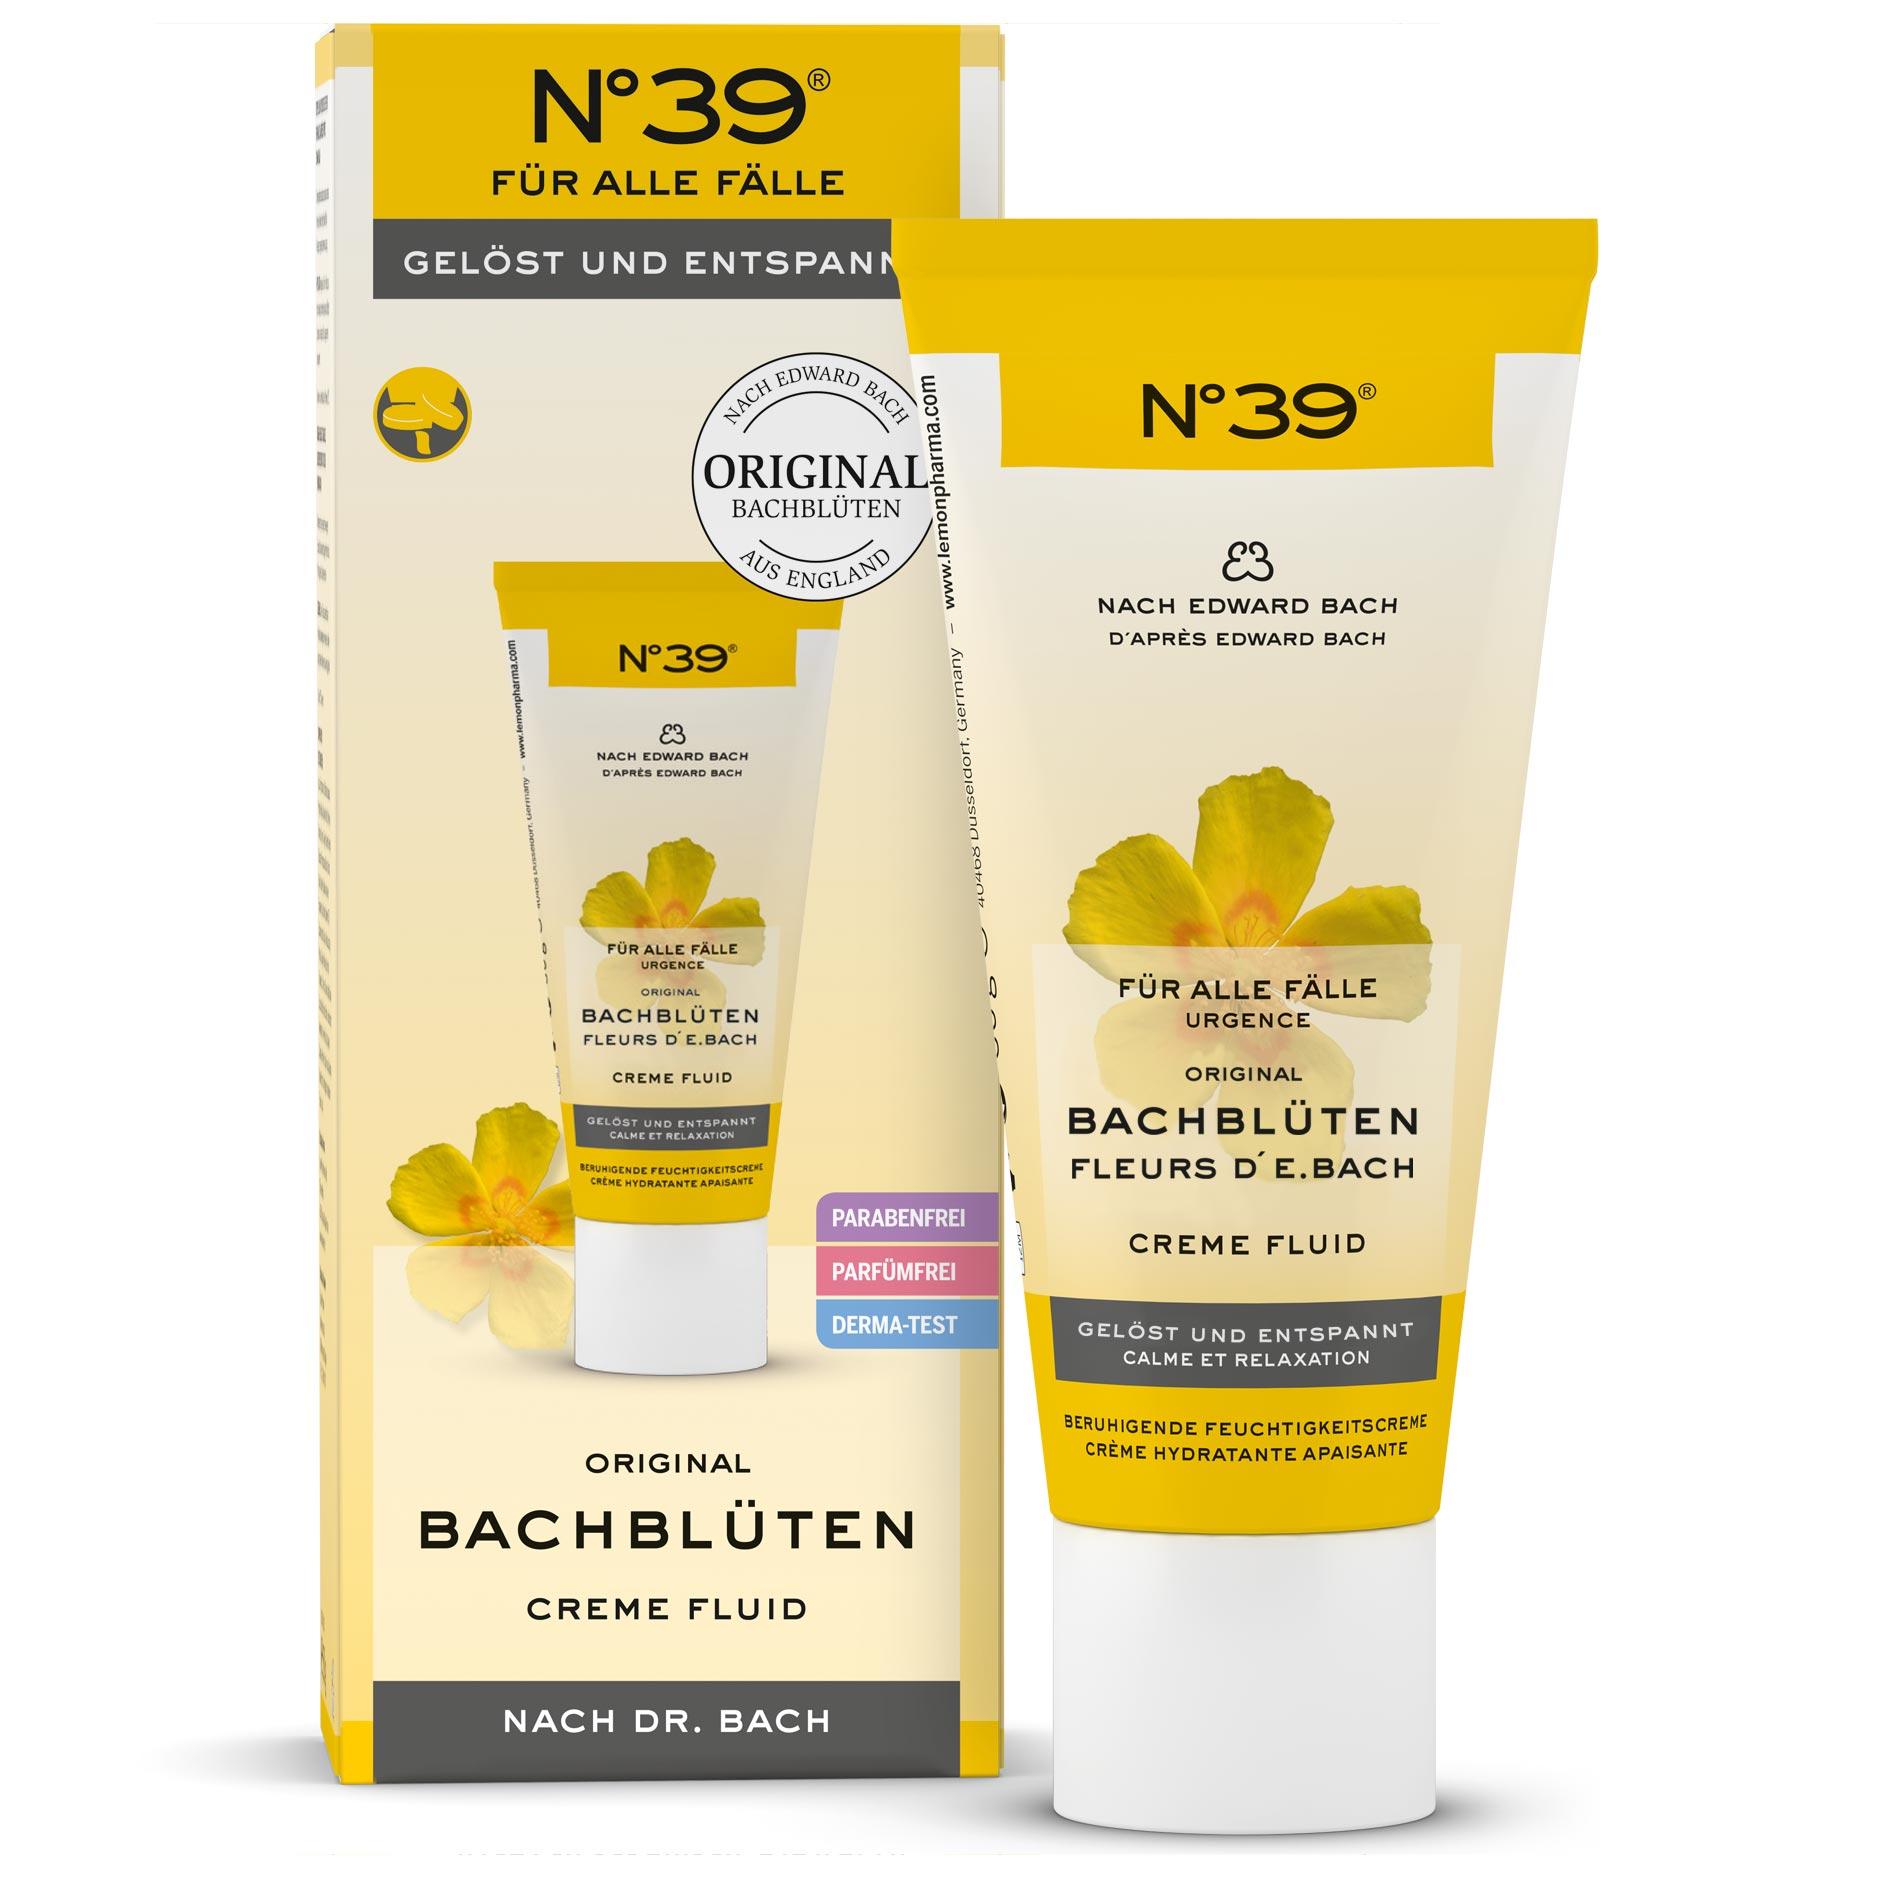 Creme Fluid 39 Für alle Fälle Lemon Pharma Original Bachblüten bach flower parfümfrei parabenfrei